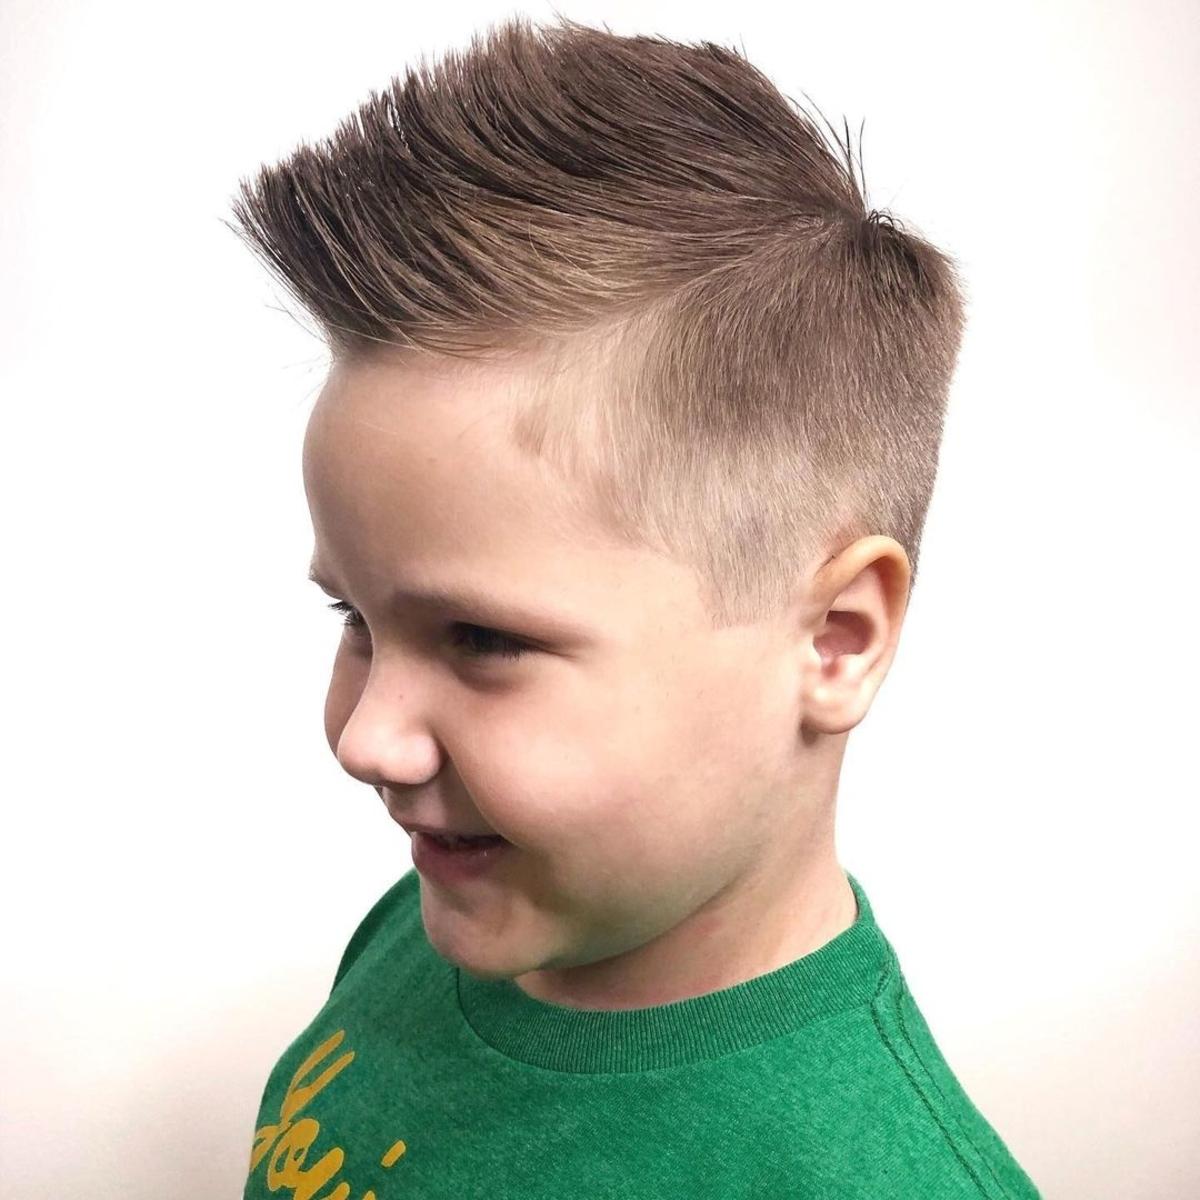 28 Cute Boys Haircuts Cool and School Ready